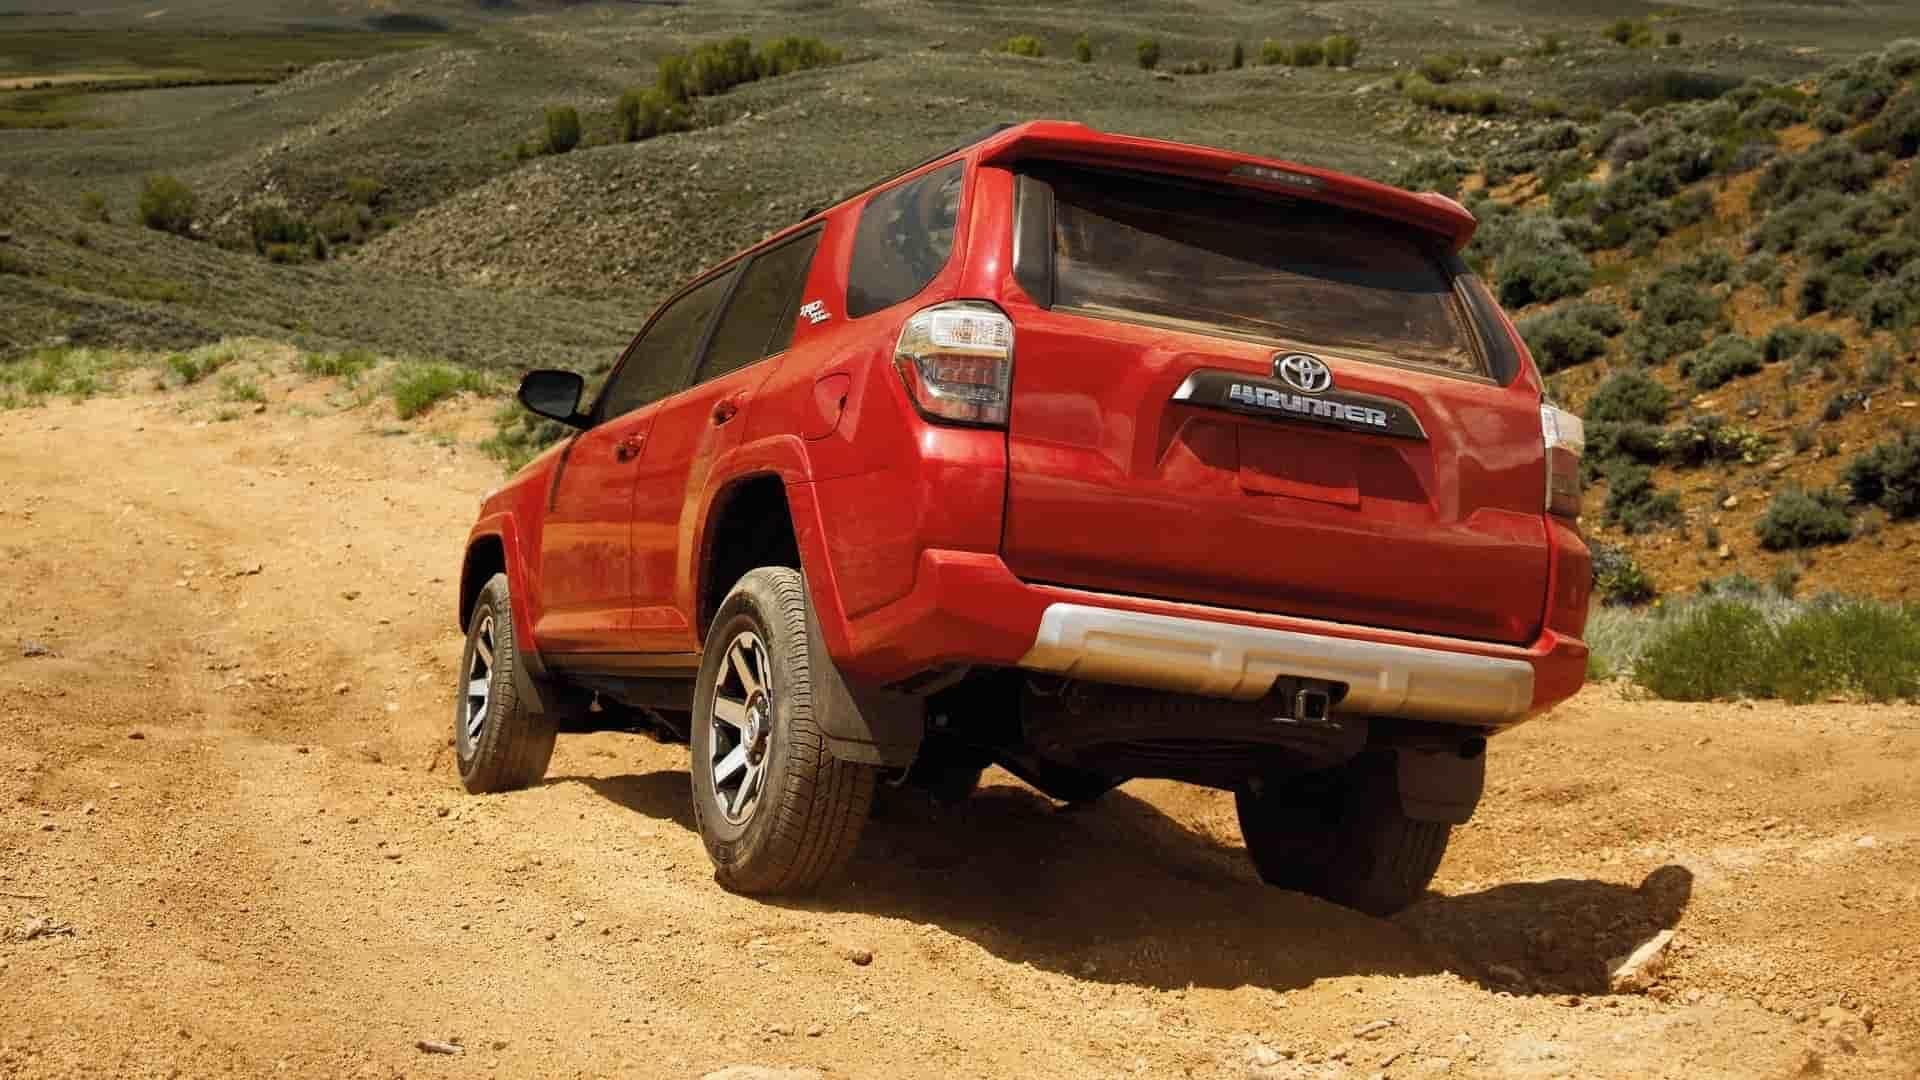 Buy, Lease, or Finance the 2020 Toyota 4Runner near Bossier City LA